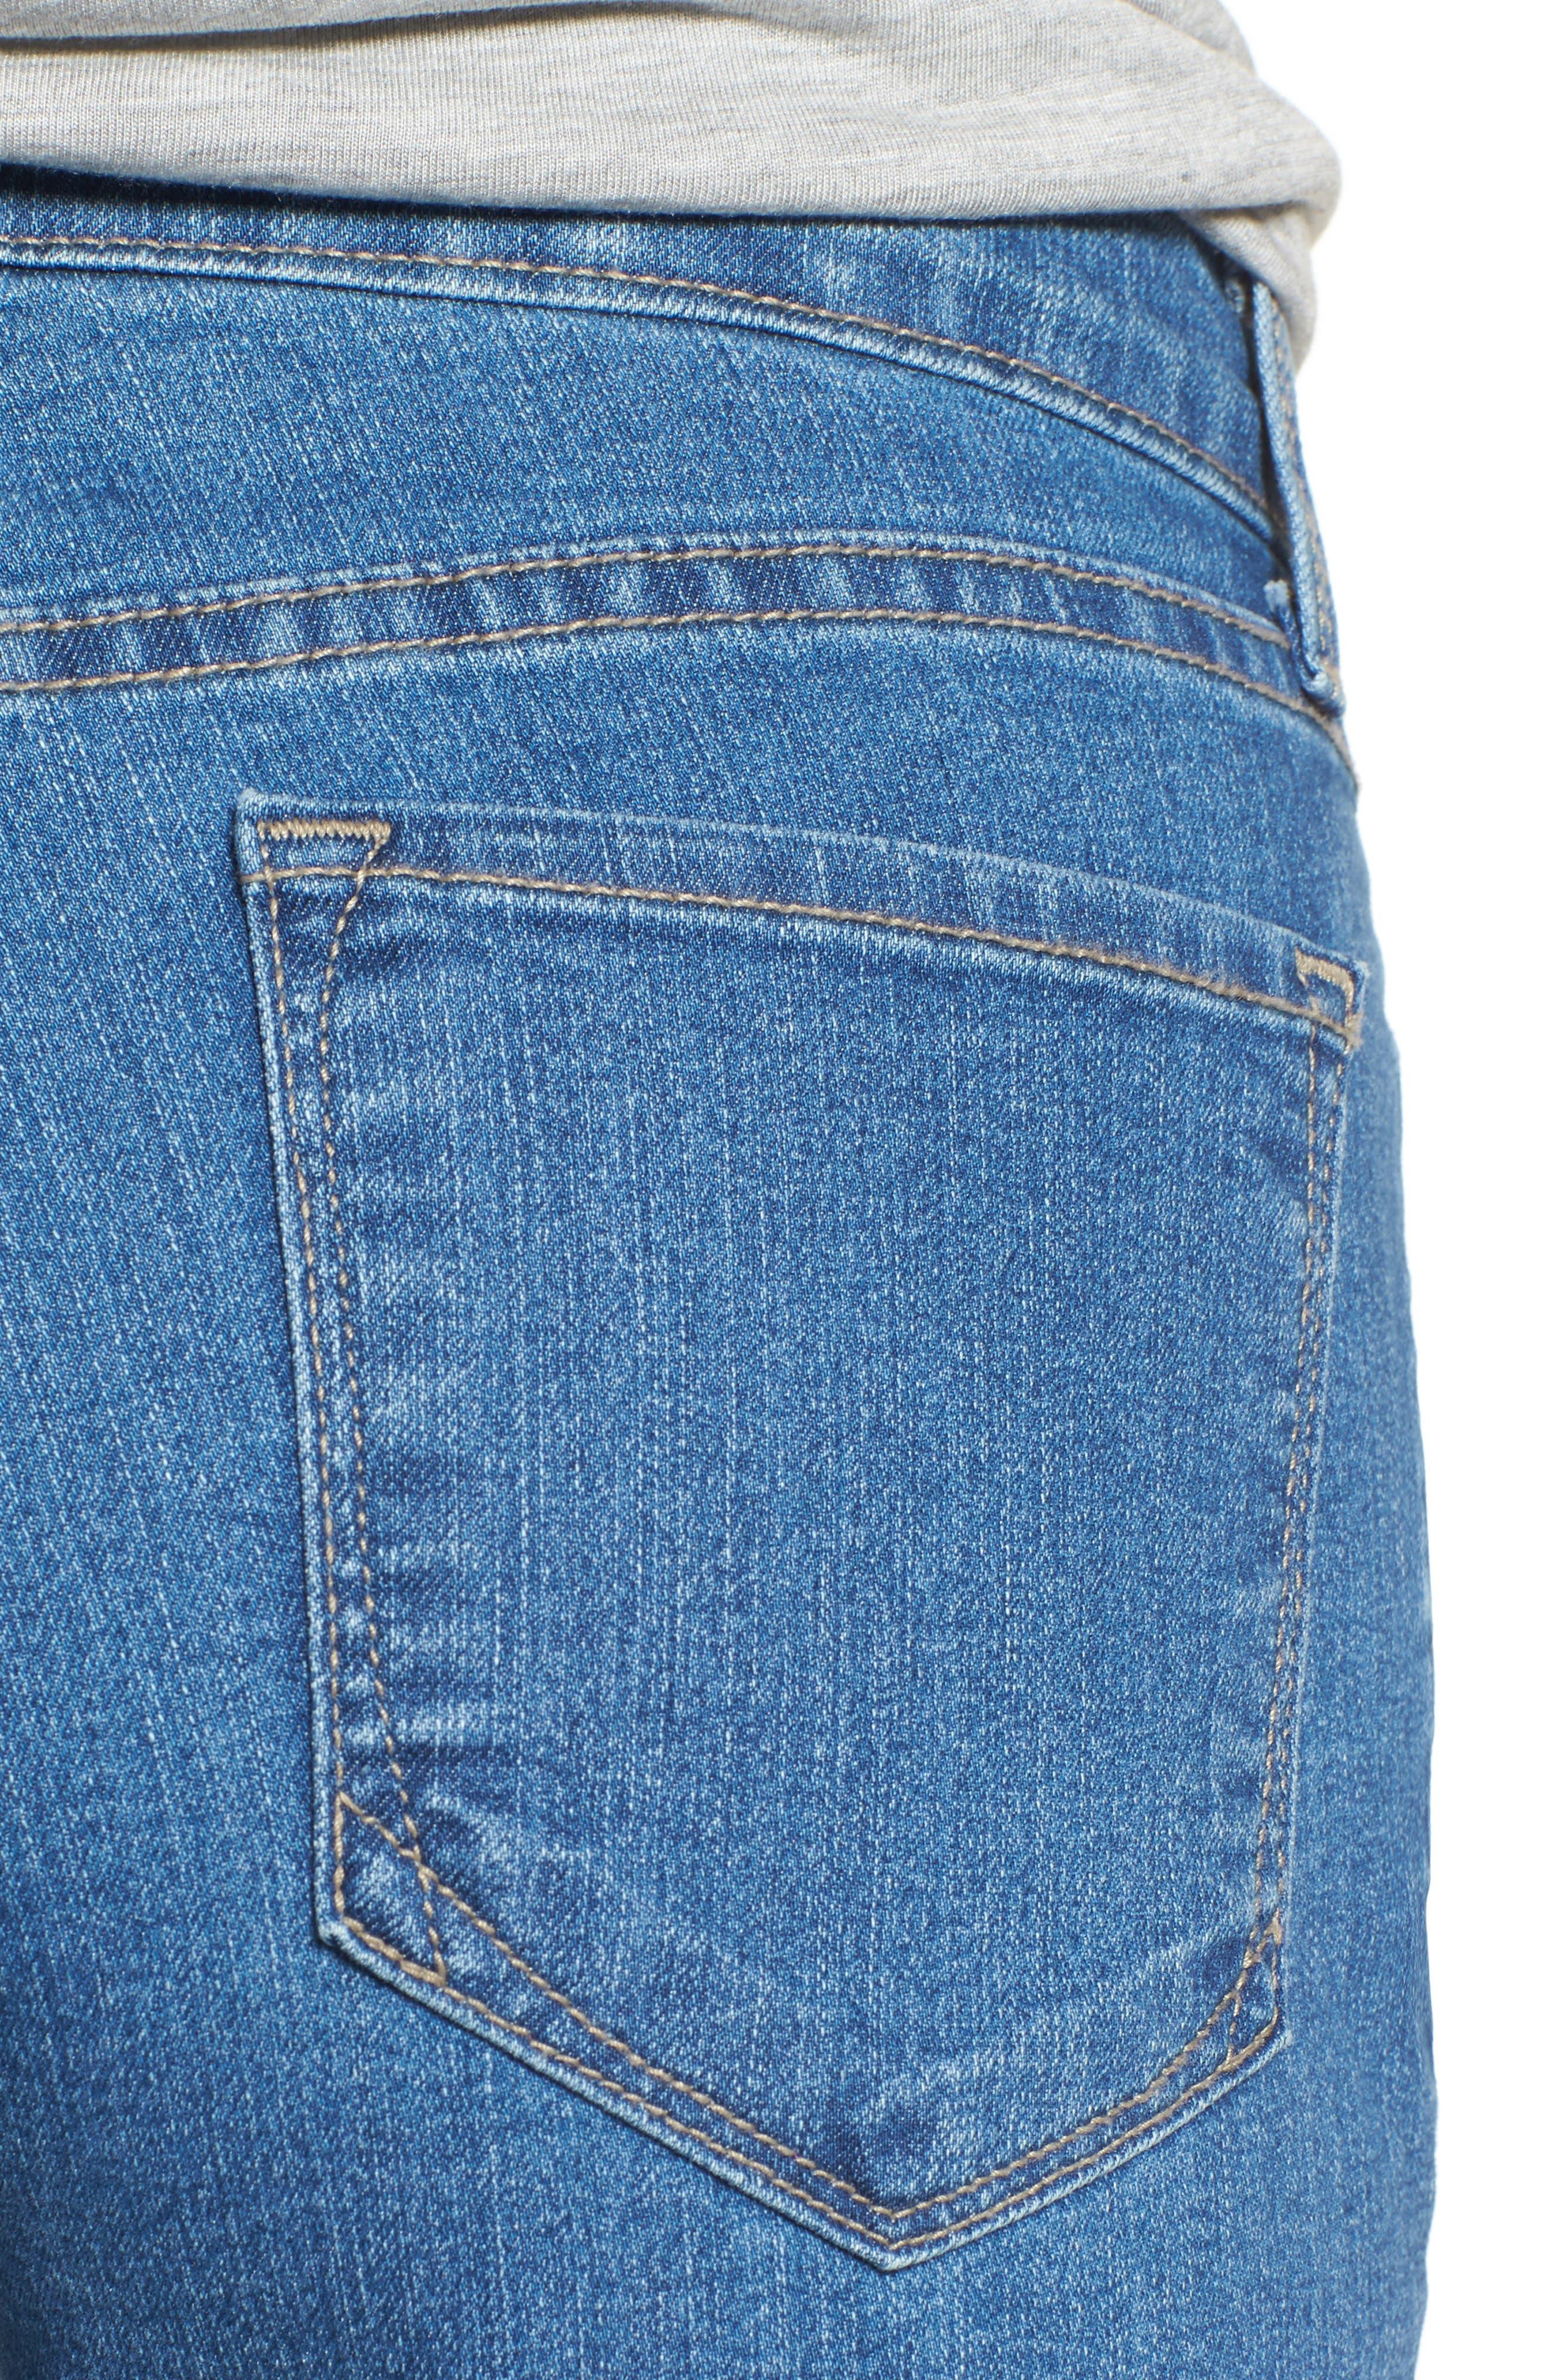 Marilyn Stretch Straight Leg Jeans,                             Alternate thumbnail 4, color,                             424